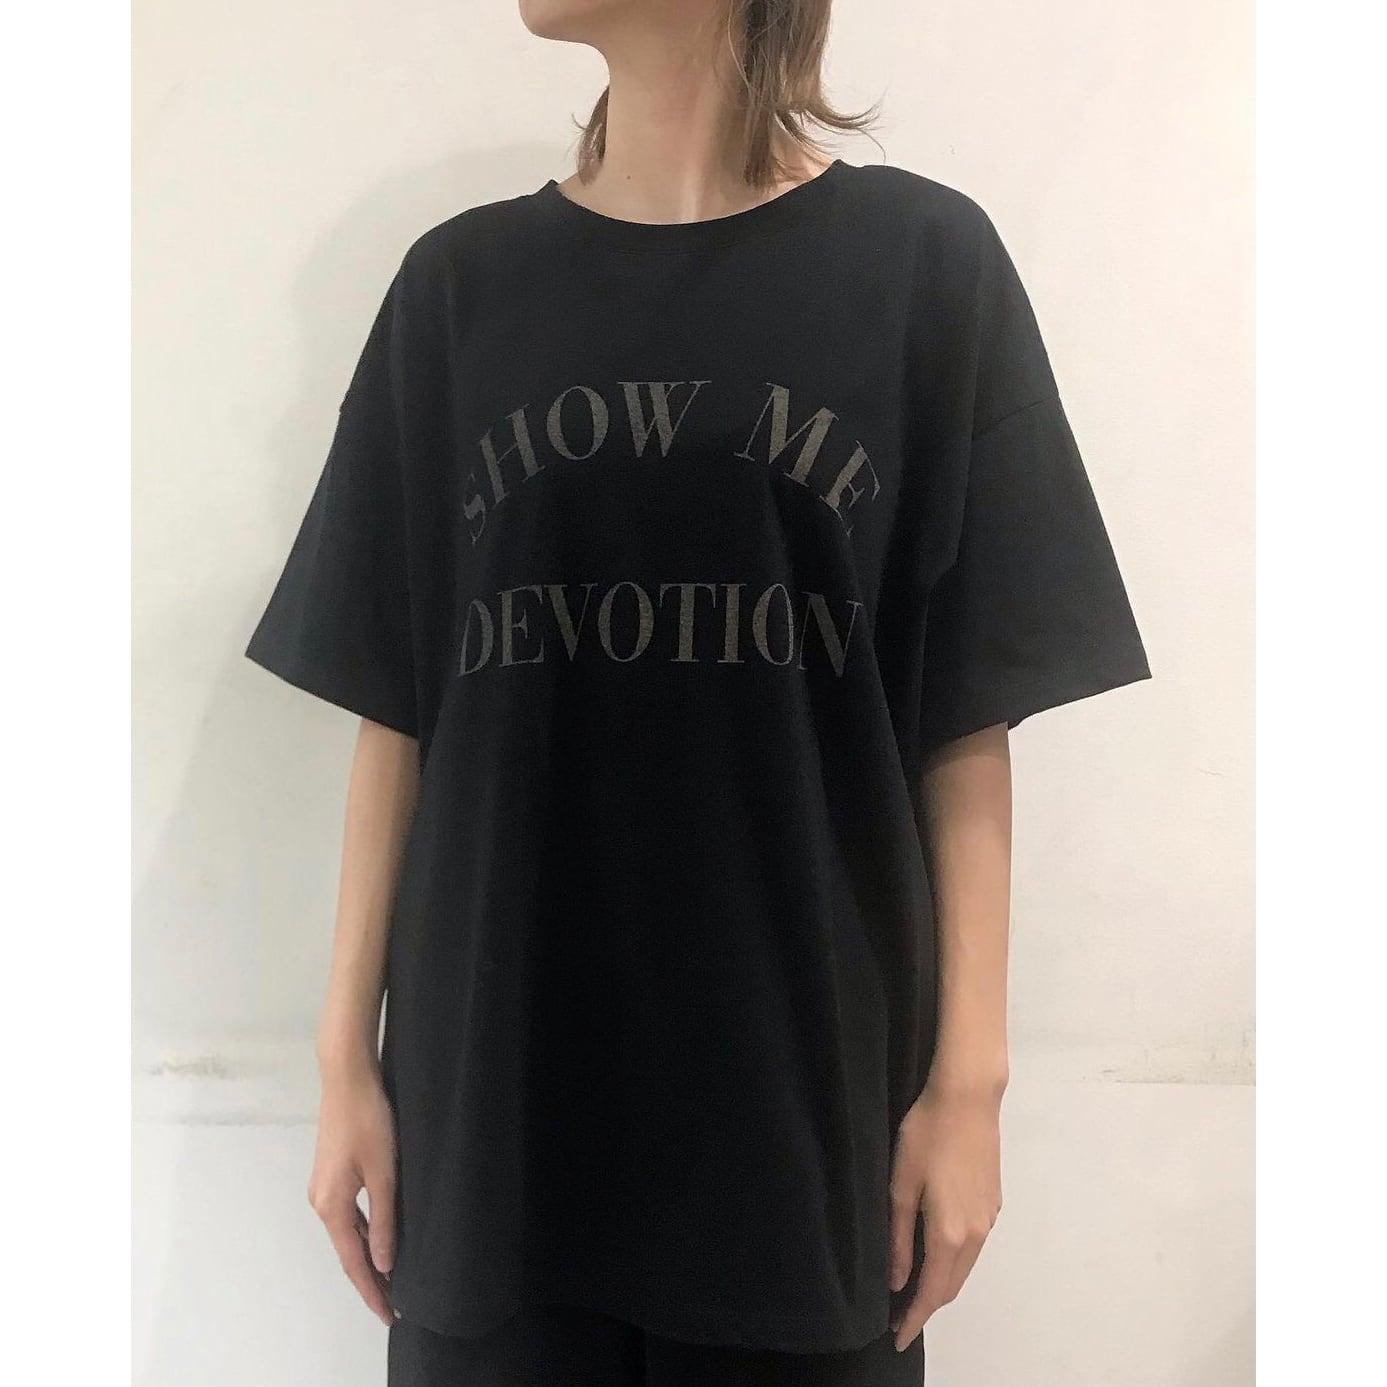 【 siro de labonte 】- R113224 - SHOW ME DEVOTION 2wayTシャツ